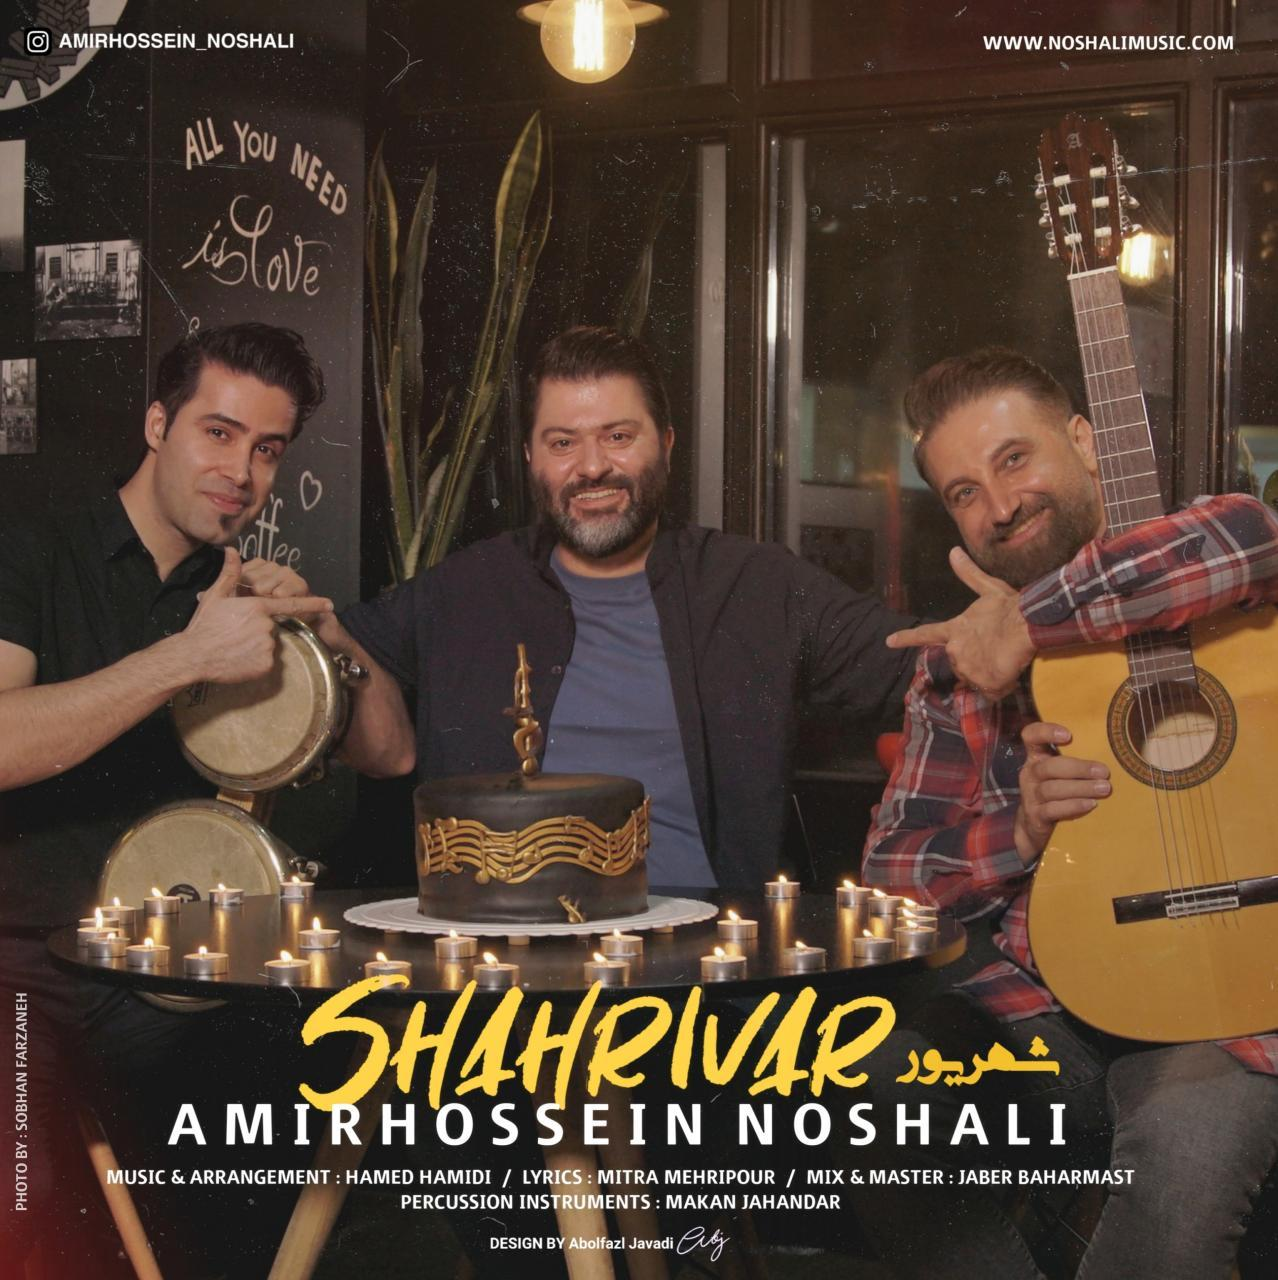 Amirhossein Noshali – Shahrivar